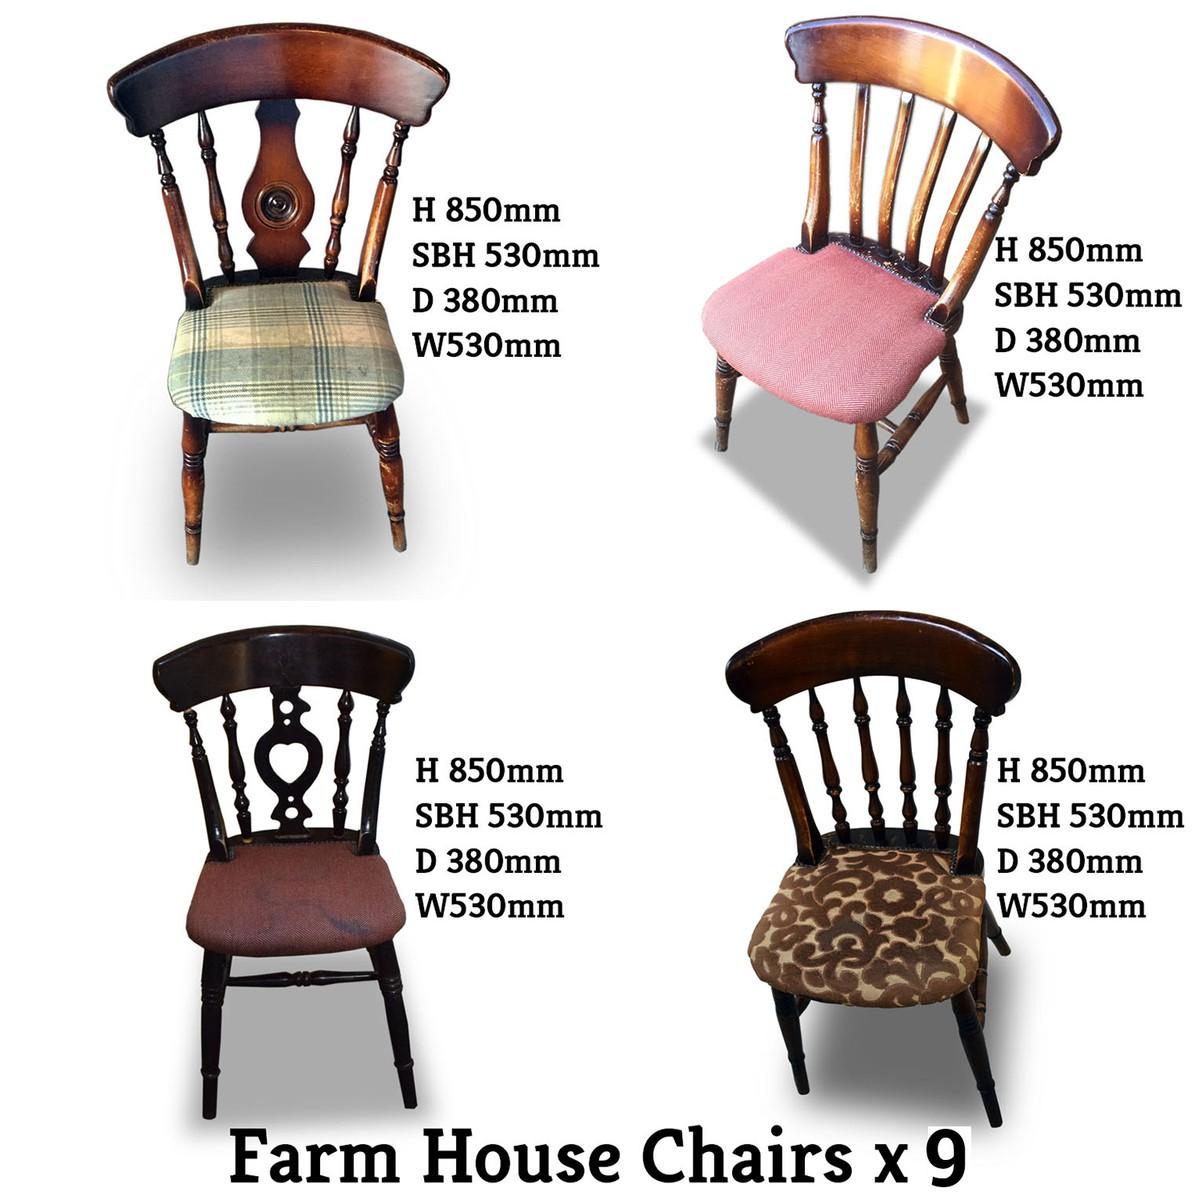 Restaurant pub furniture for sale